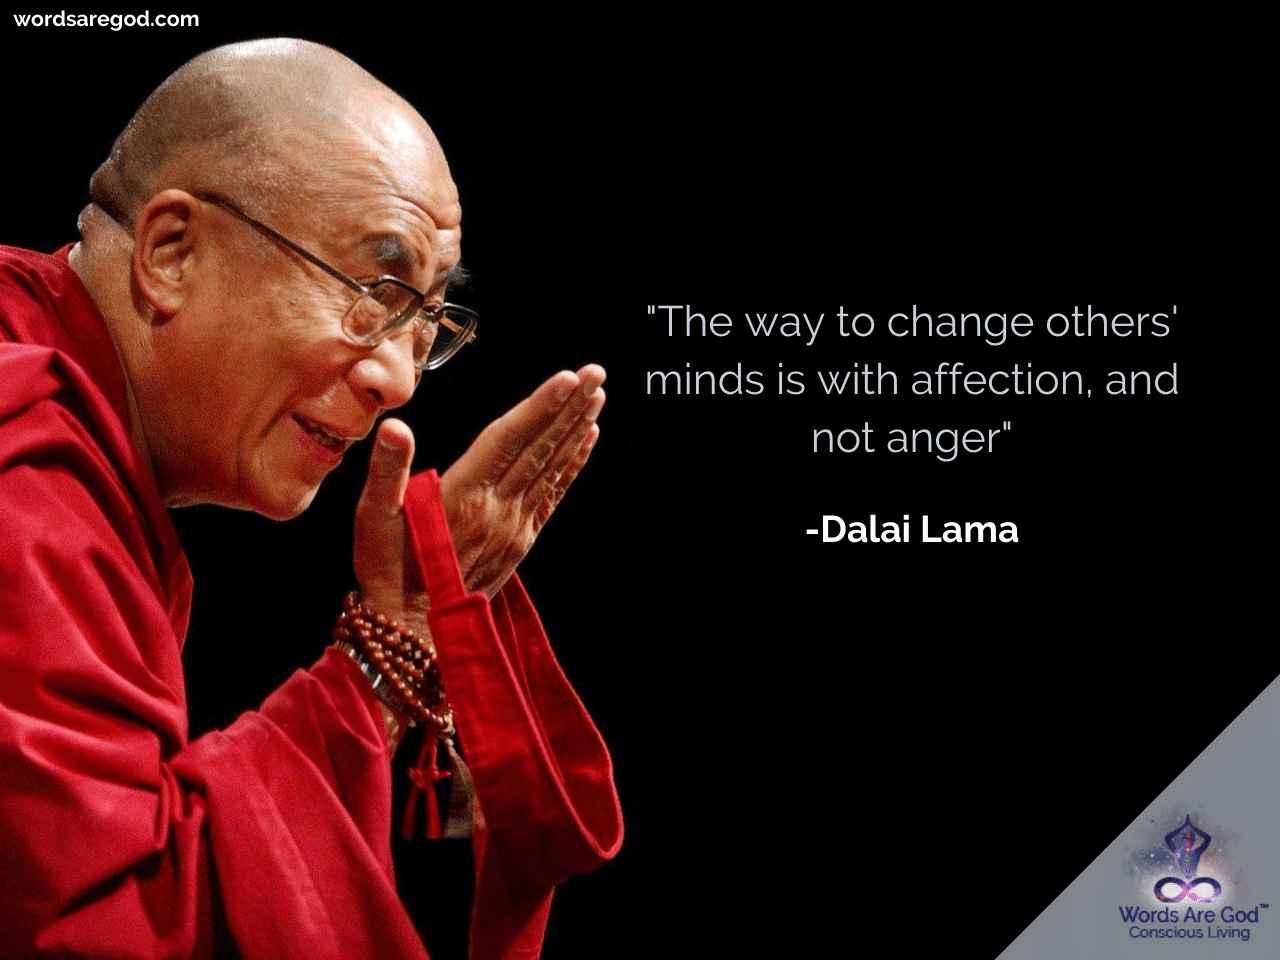 Dalai Lama Best Quote